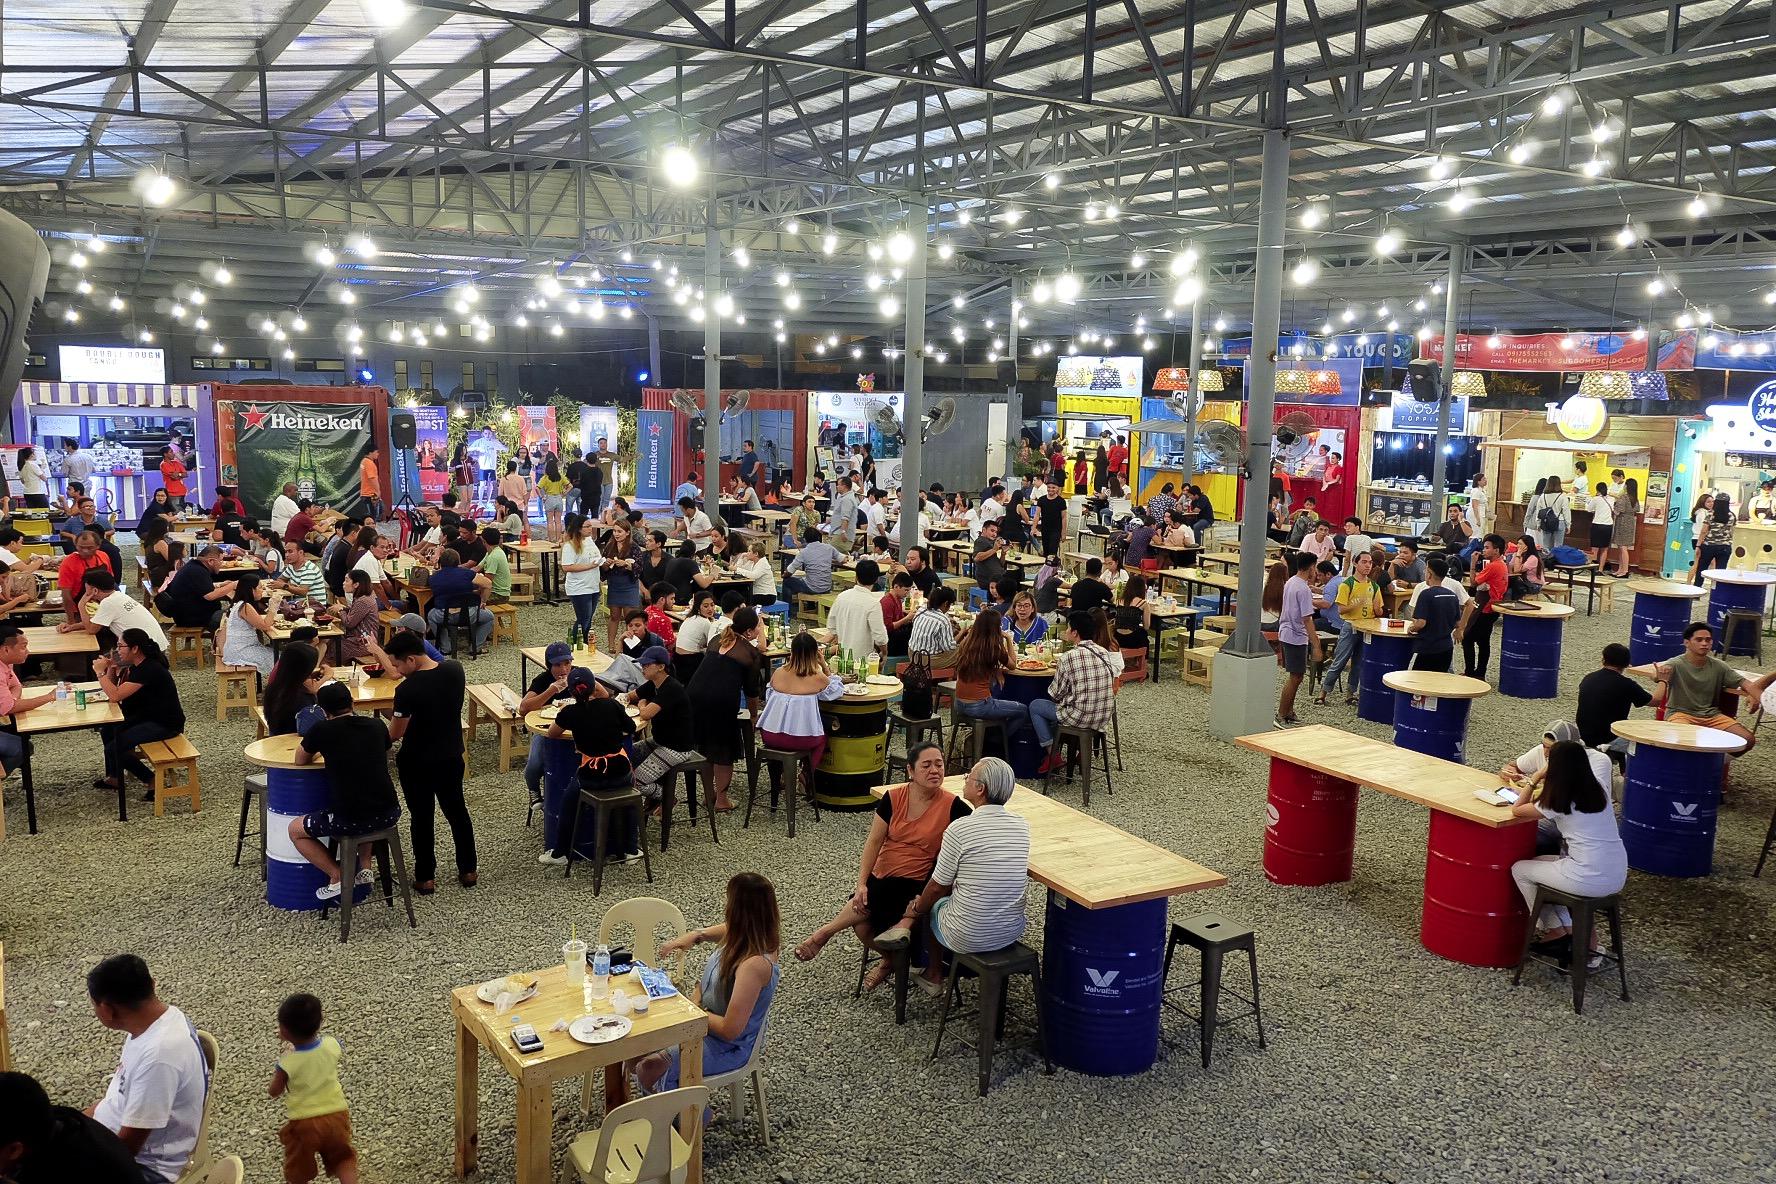 The-Market-by-Sugbo-Mercado-iamkimcharlie-06